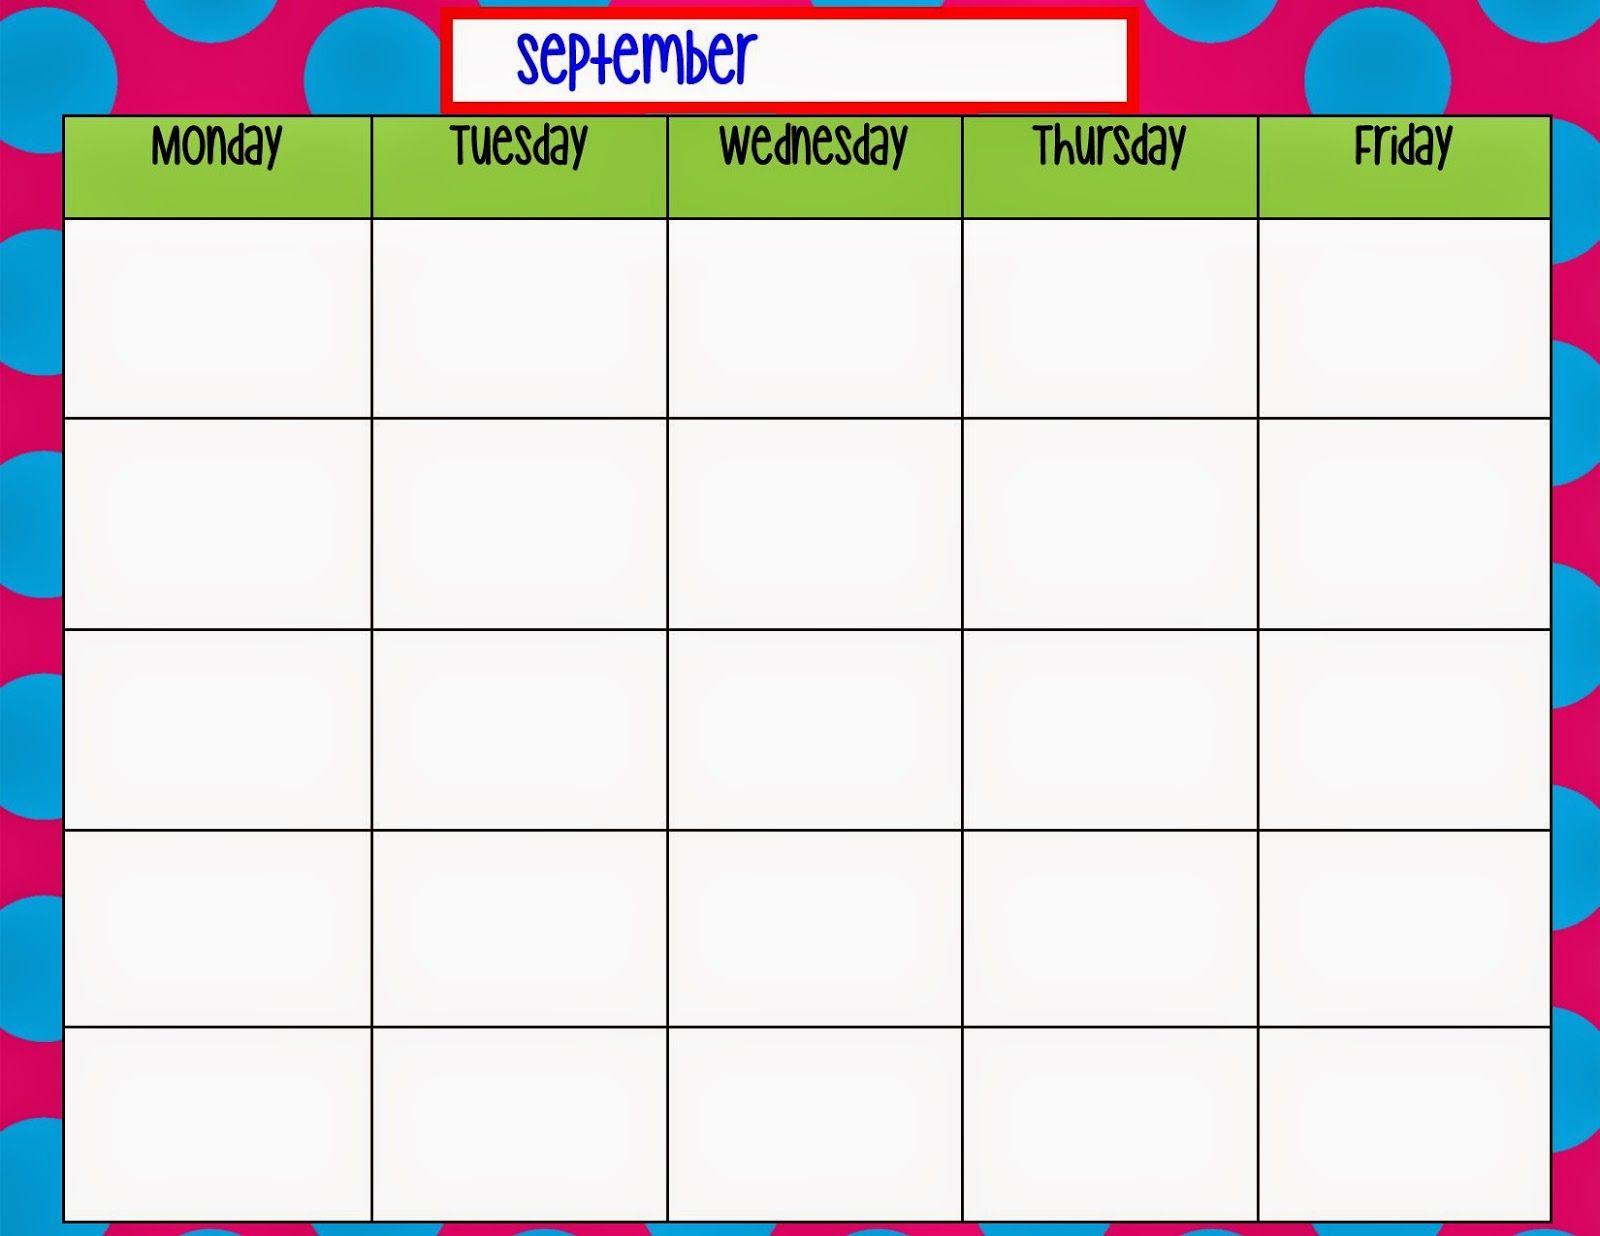 Monday Through Friday Calendar Template | Weekly Calendar pertaining to Free Printable Calendar Monday Through Friday